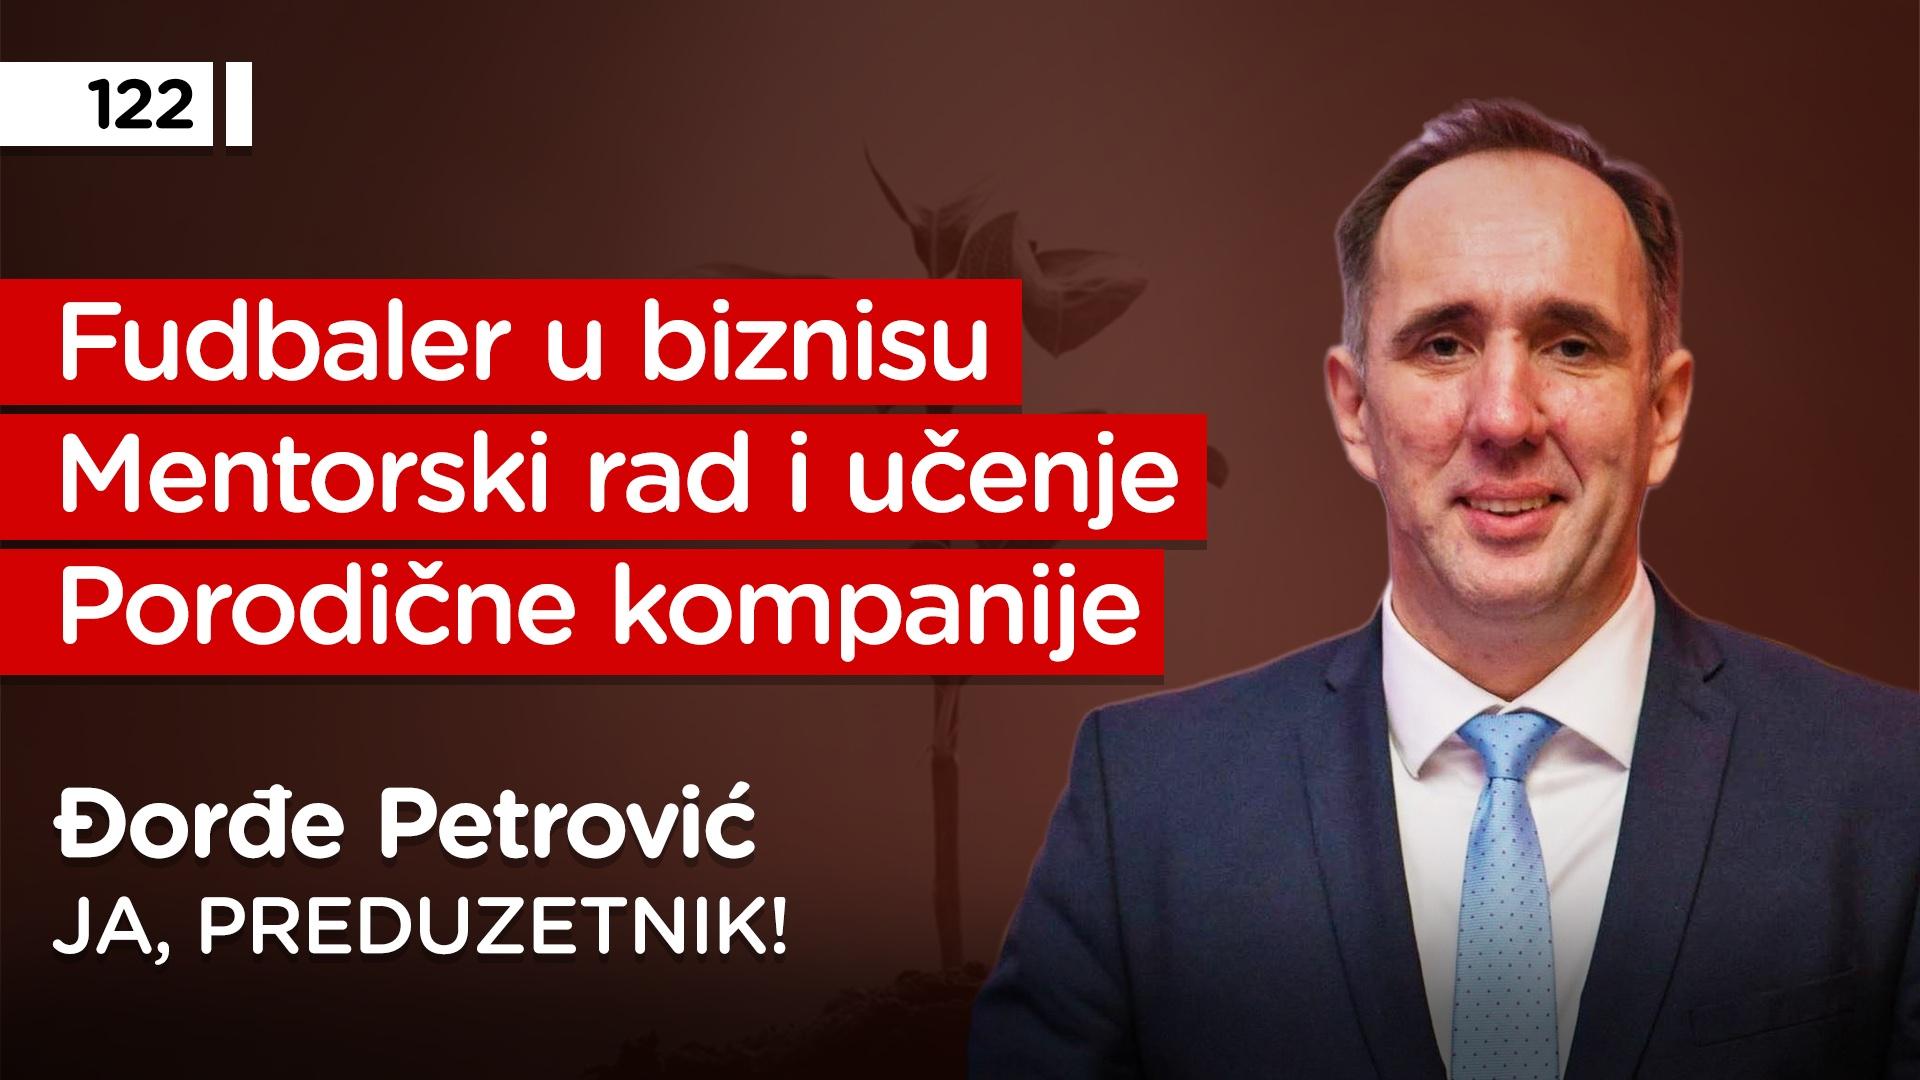 EP122: Đorđe Petrović